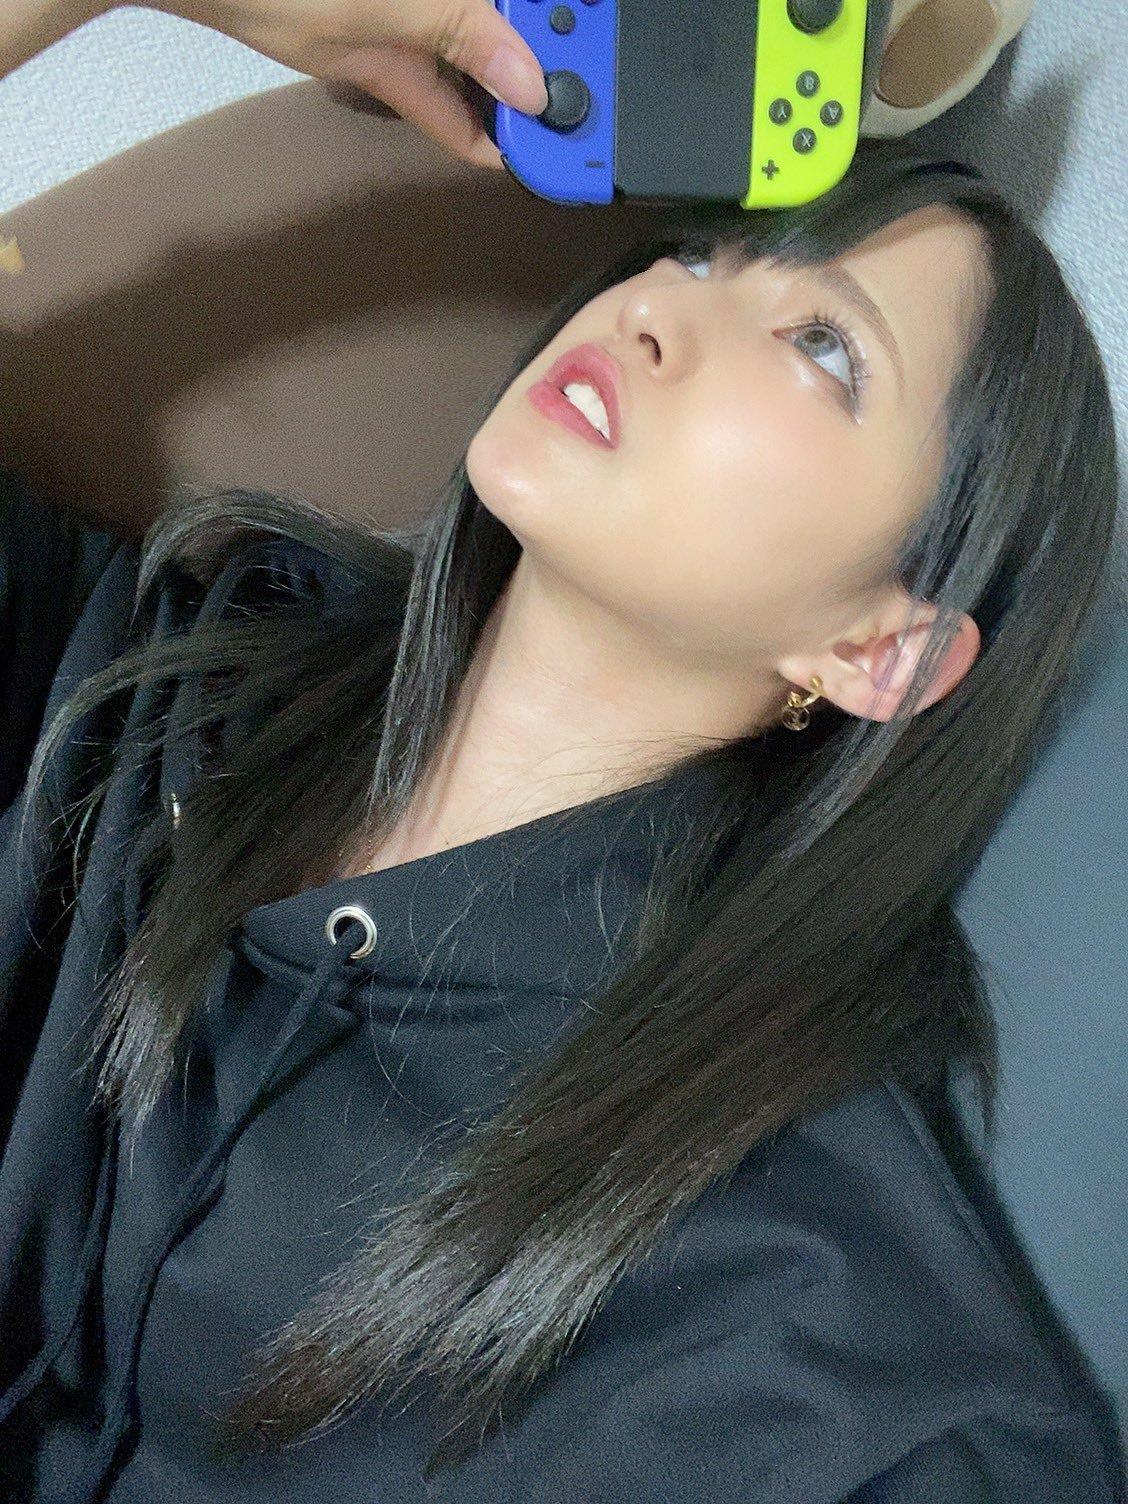 nagisa_micky 1251197100311879682_p0